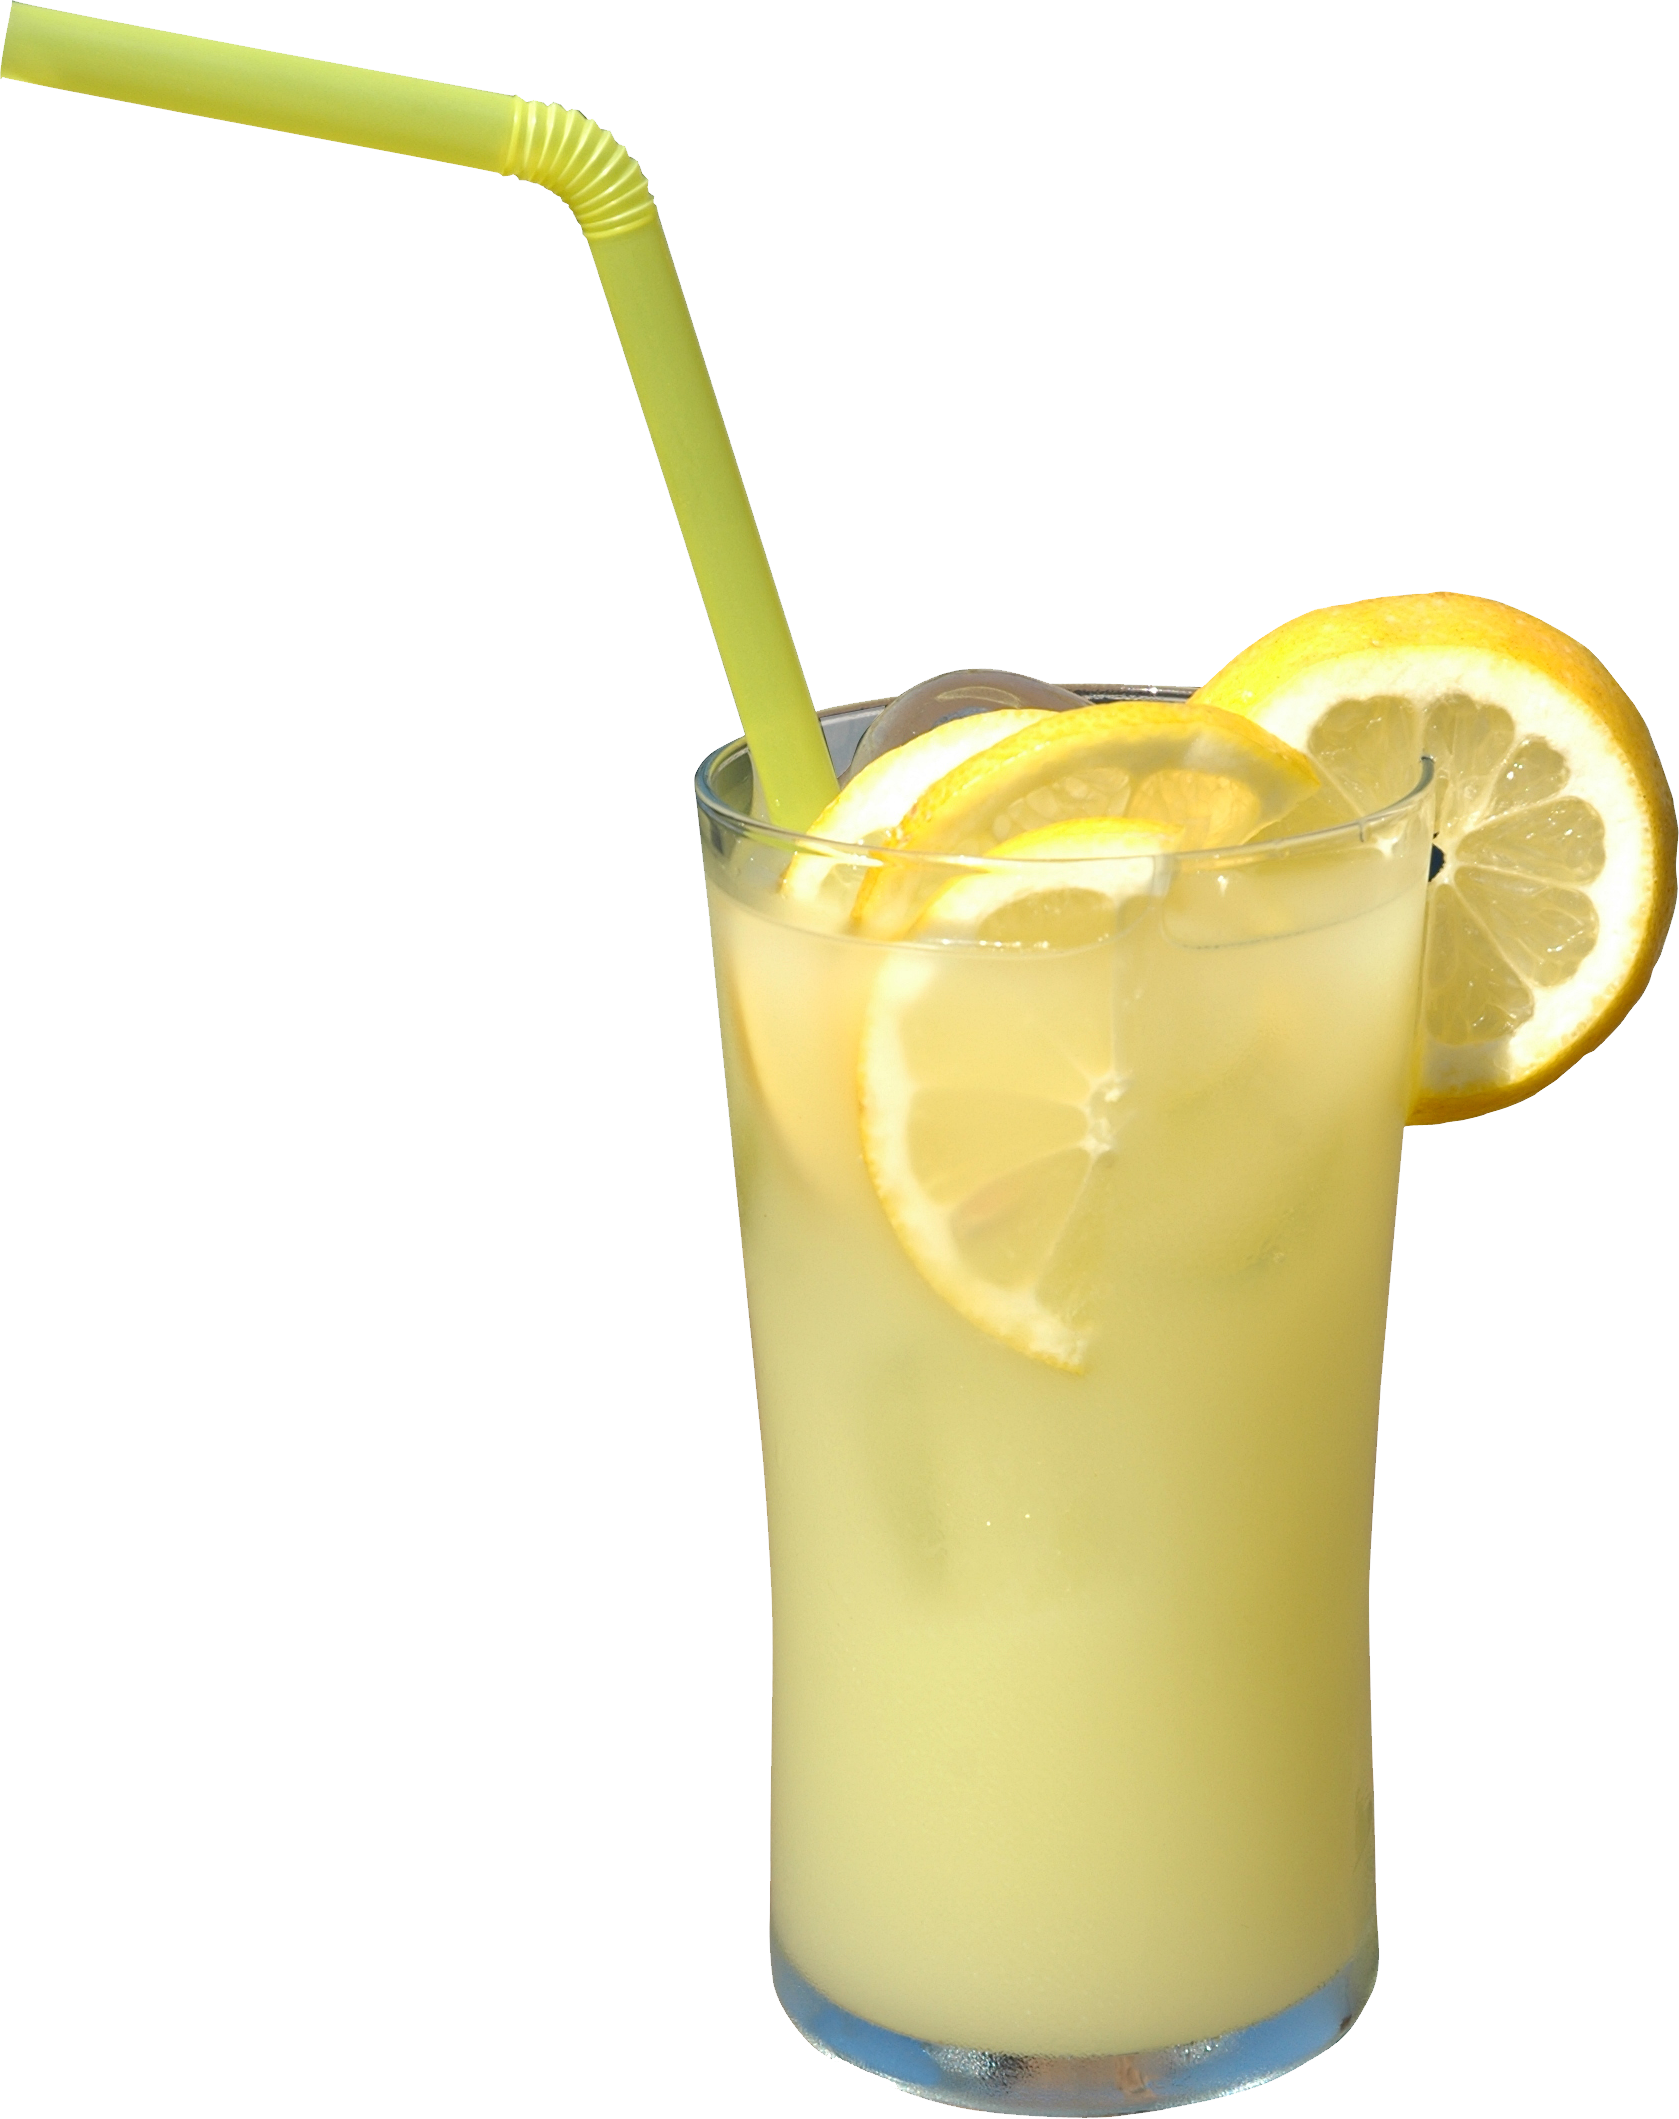 Lemonade png image purepng. Drinks clipart lime juice